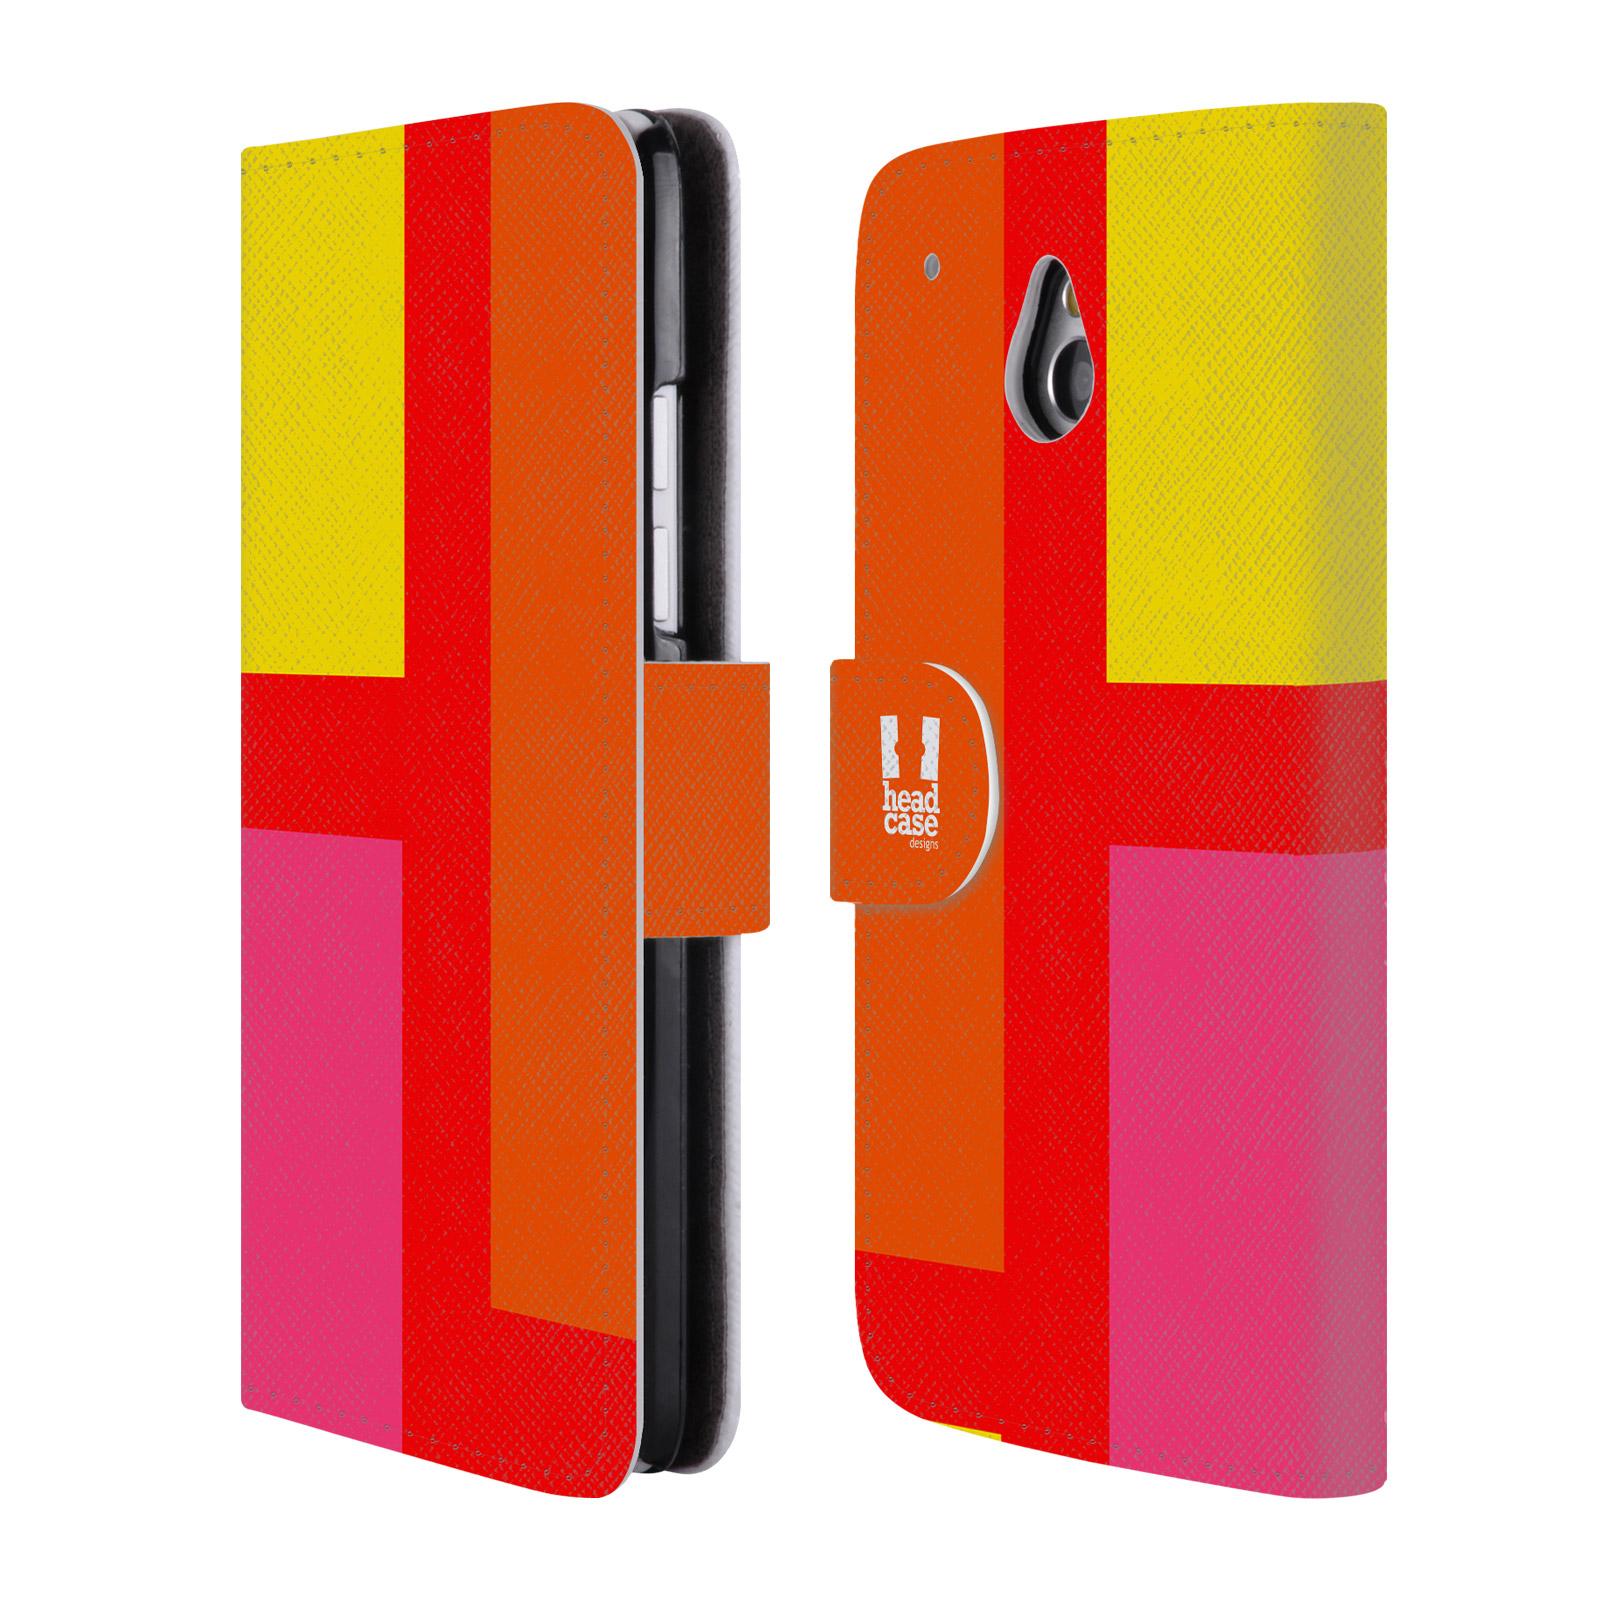 HEAD CASE Flipové pouzdro pro mobil HTC ONE MINI barevné tvary oranžová ulice